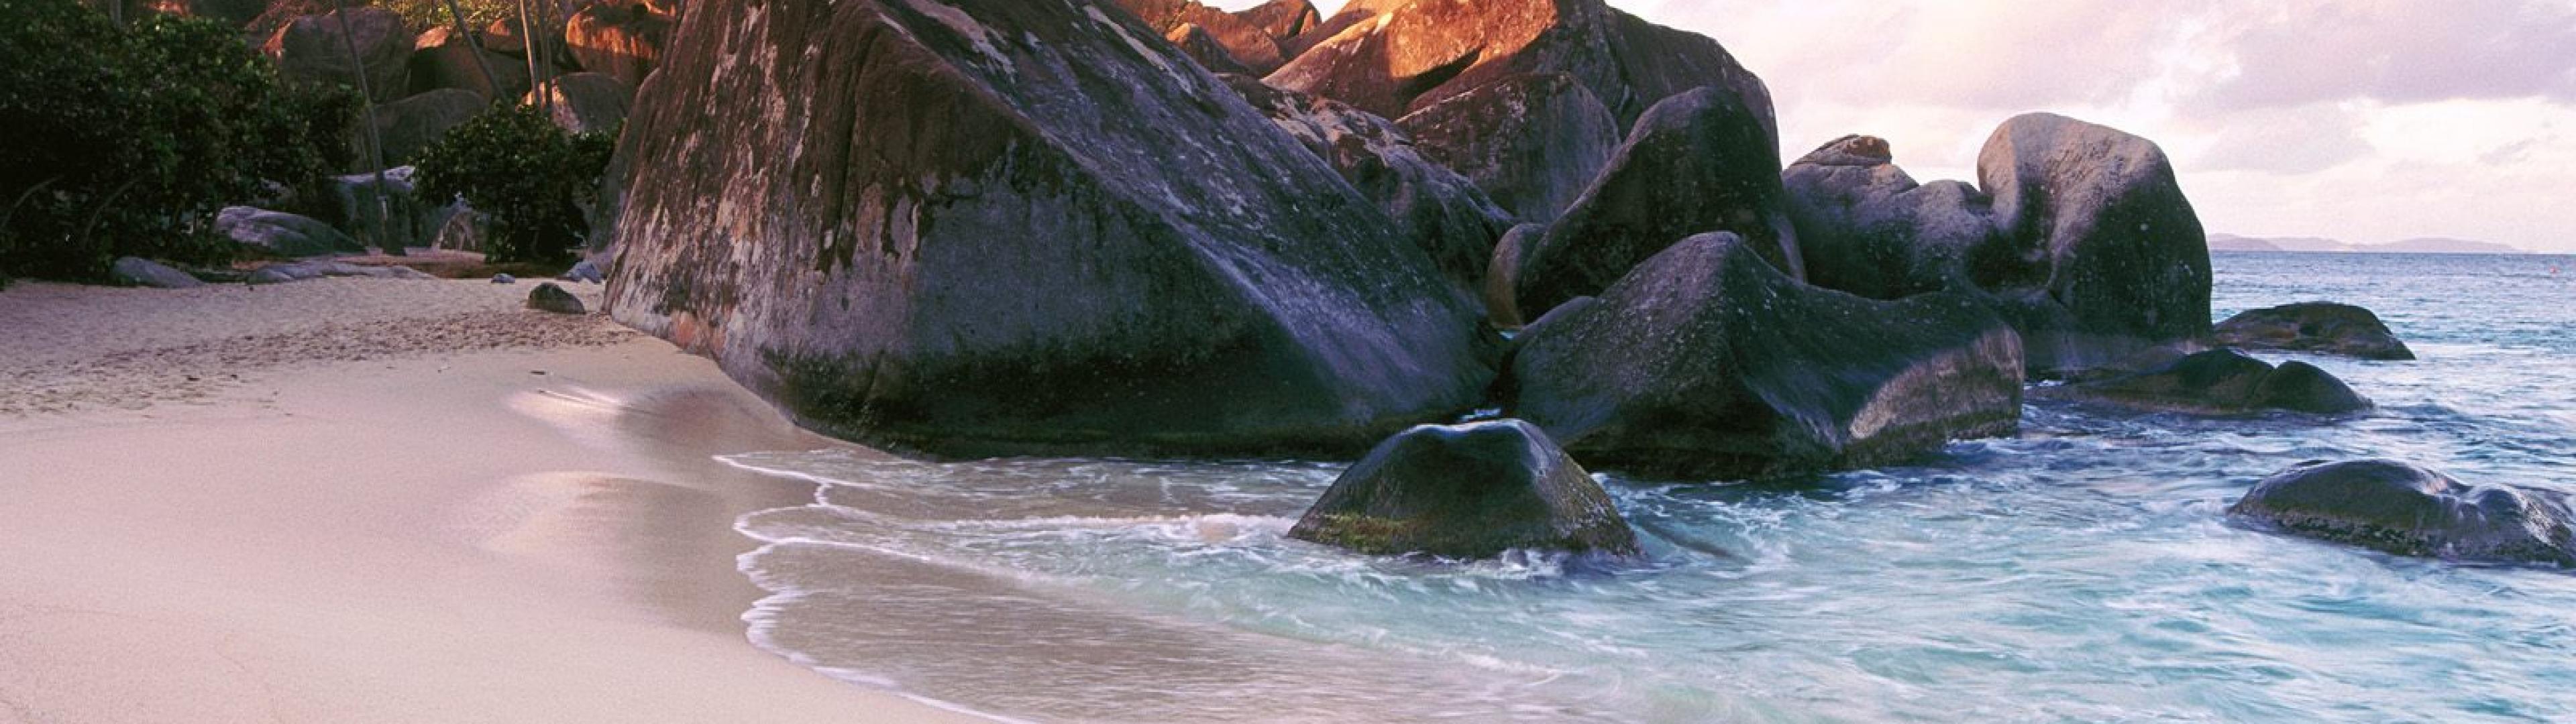 The Baths, Virgin Gorda Island, British Virgin Islands, West Indies  № 1471437 загрузить